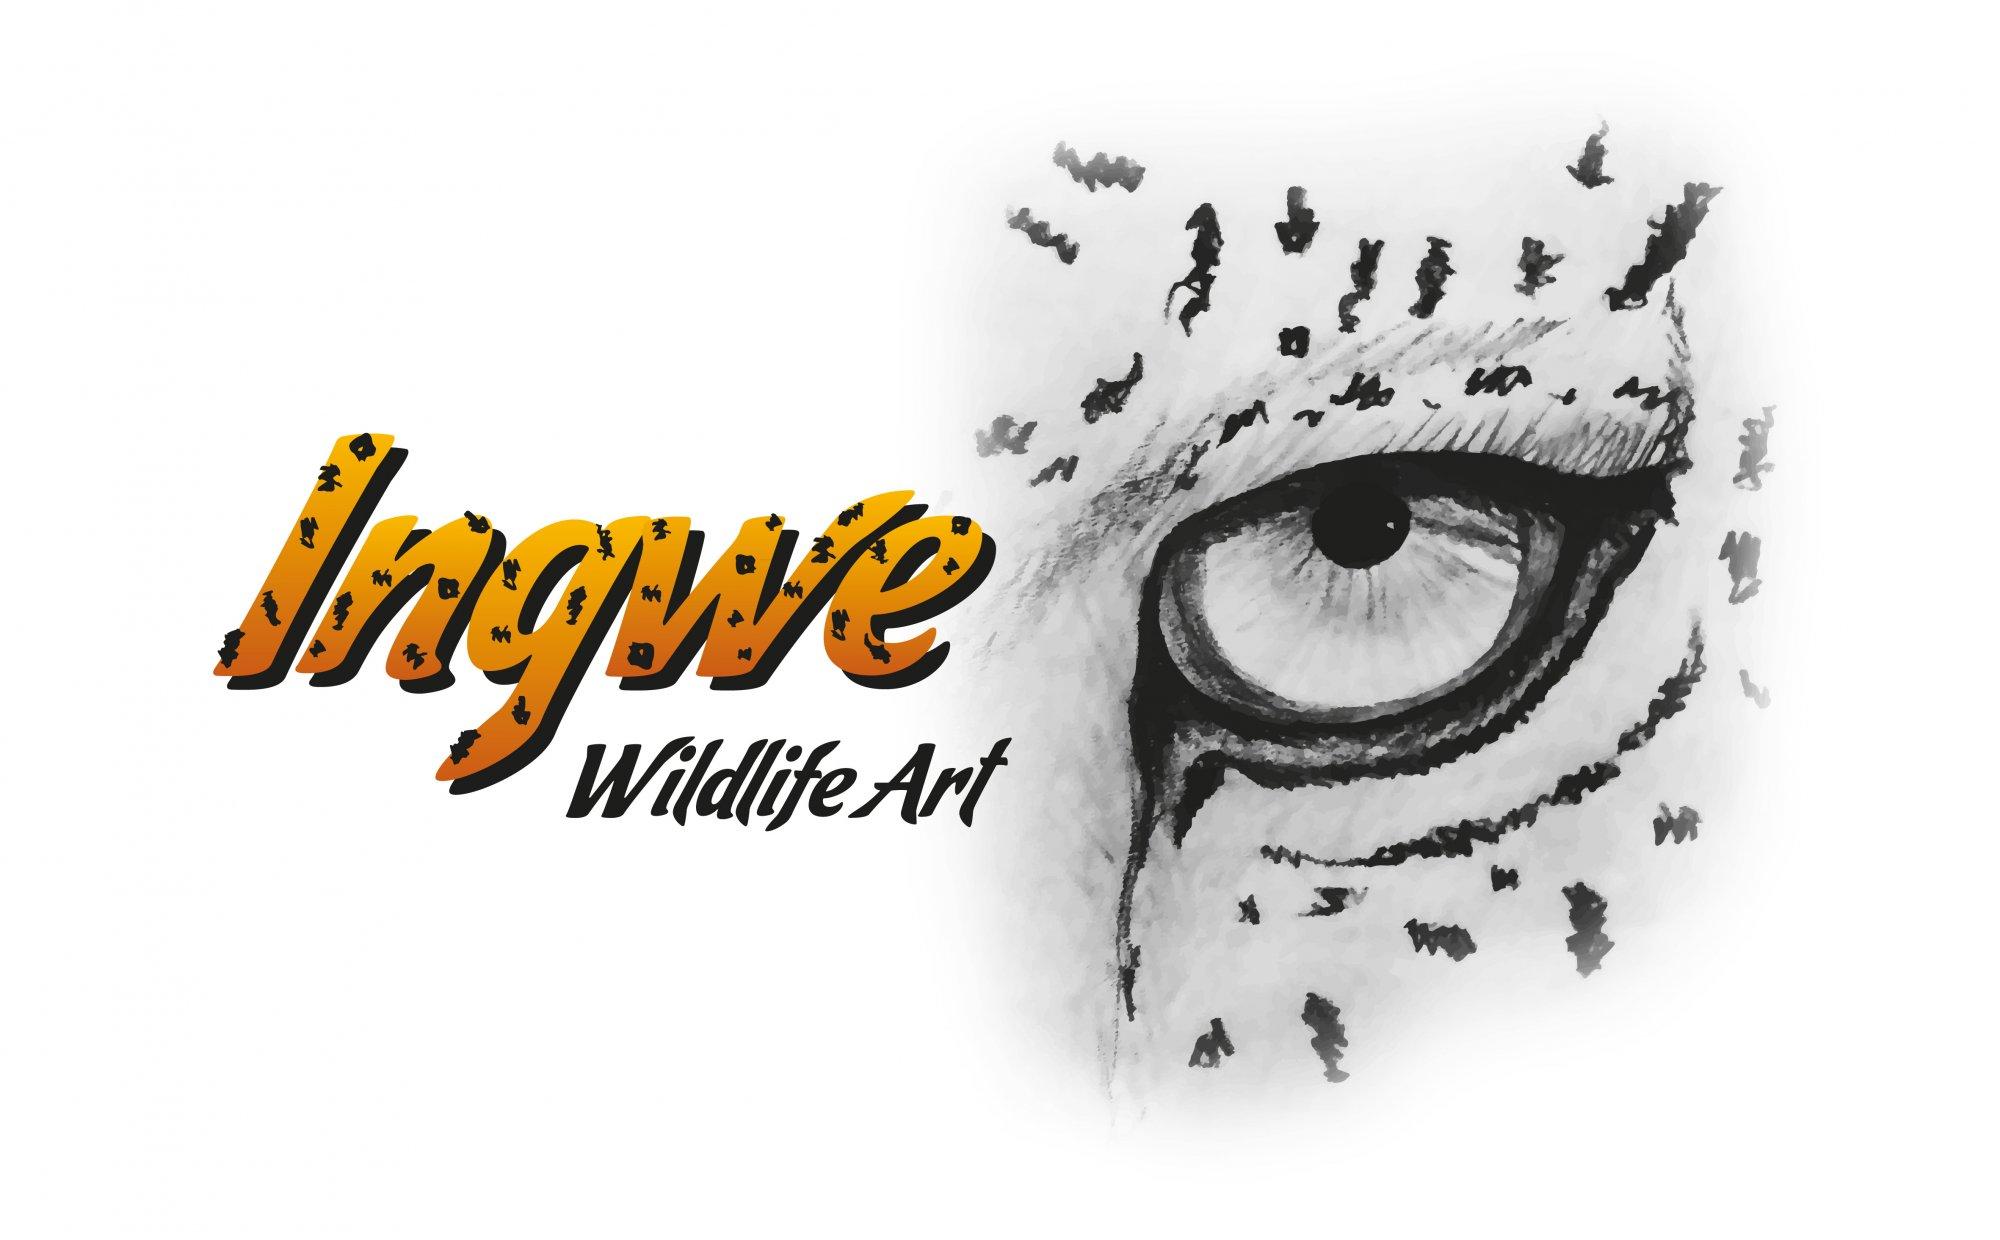 Ingwe Wildlife Art Brands Of The World Download